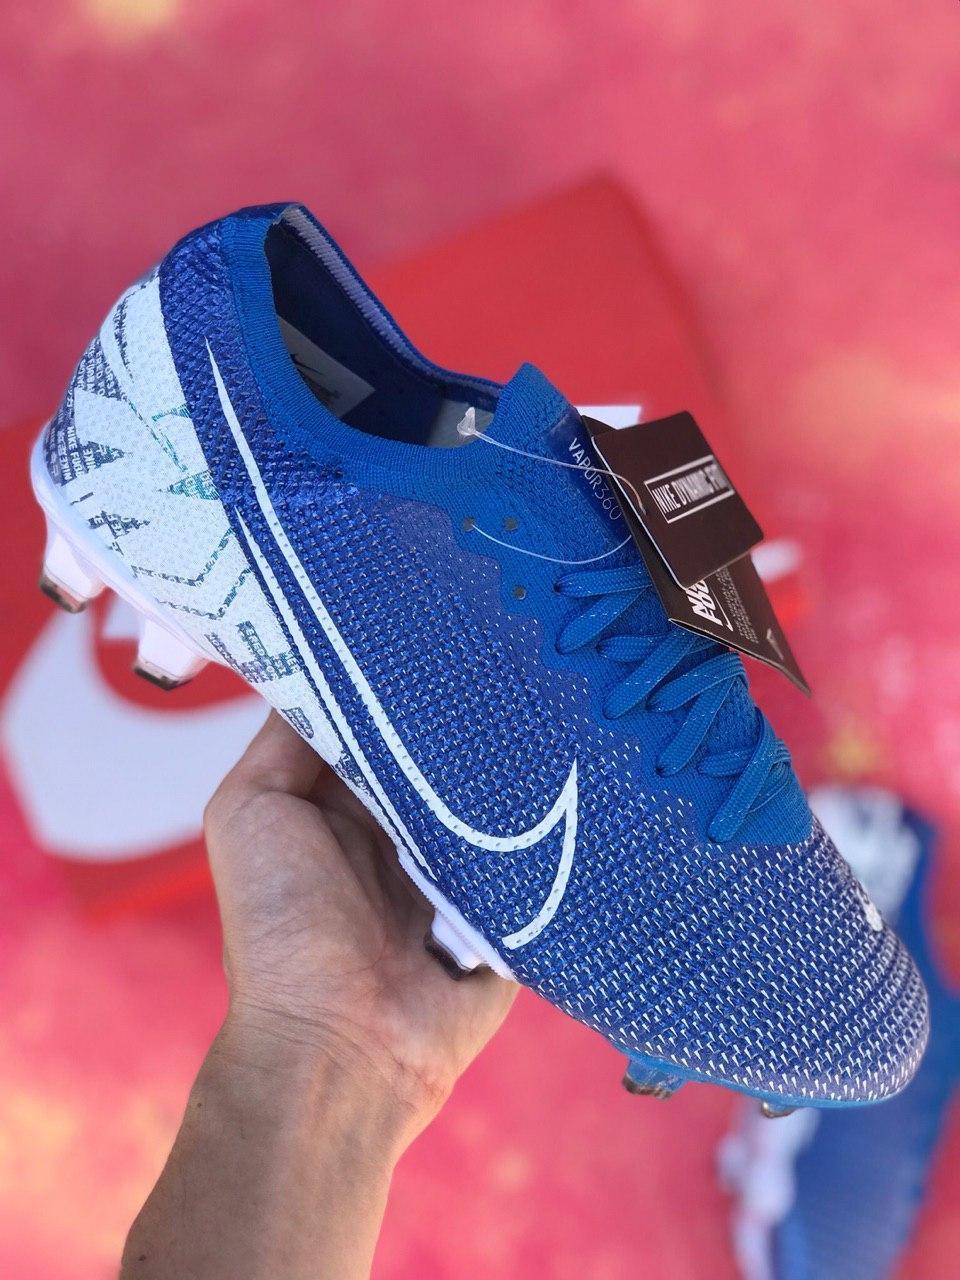 Бутсы Nike Mercurial Vapor 13 Elite FG (найк меркуриал вапор элит) - 45